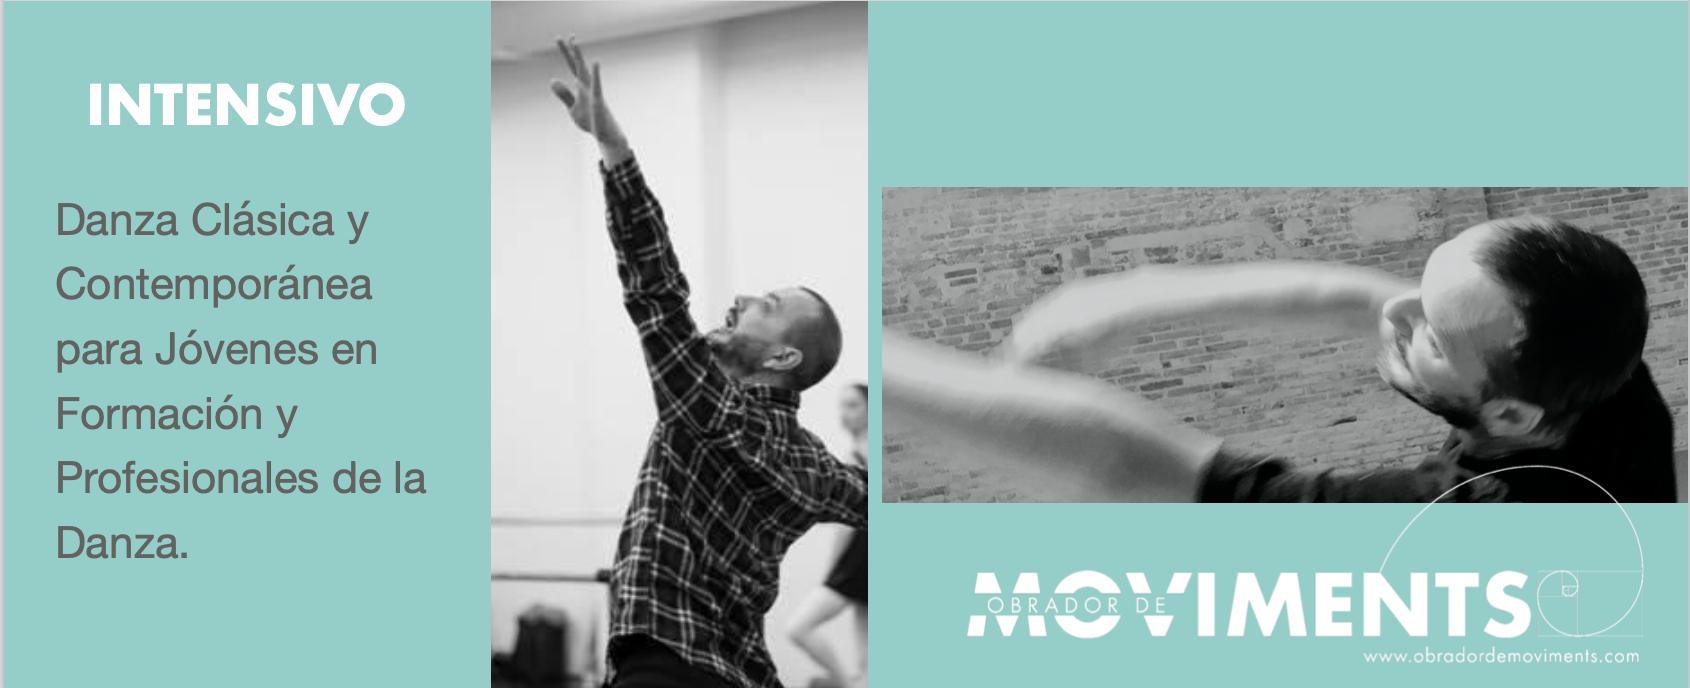 Intensivo danza clásica Barcelona | Obrador de Moviments